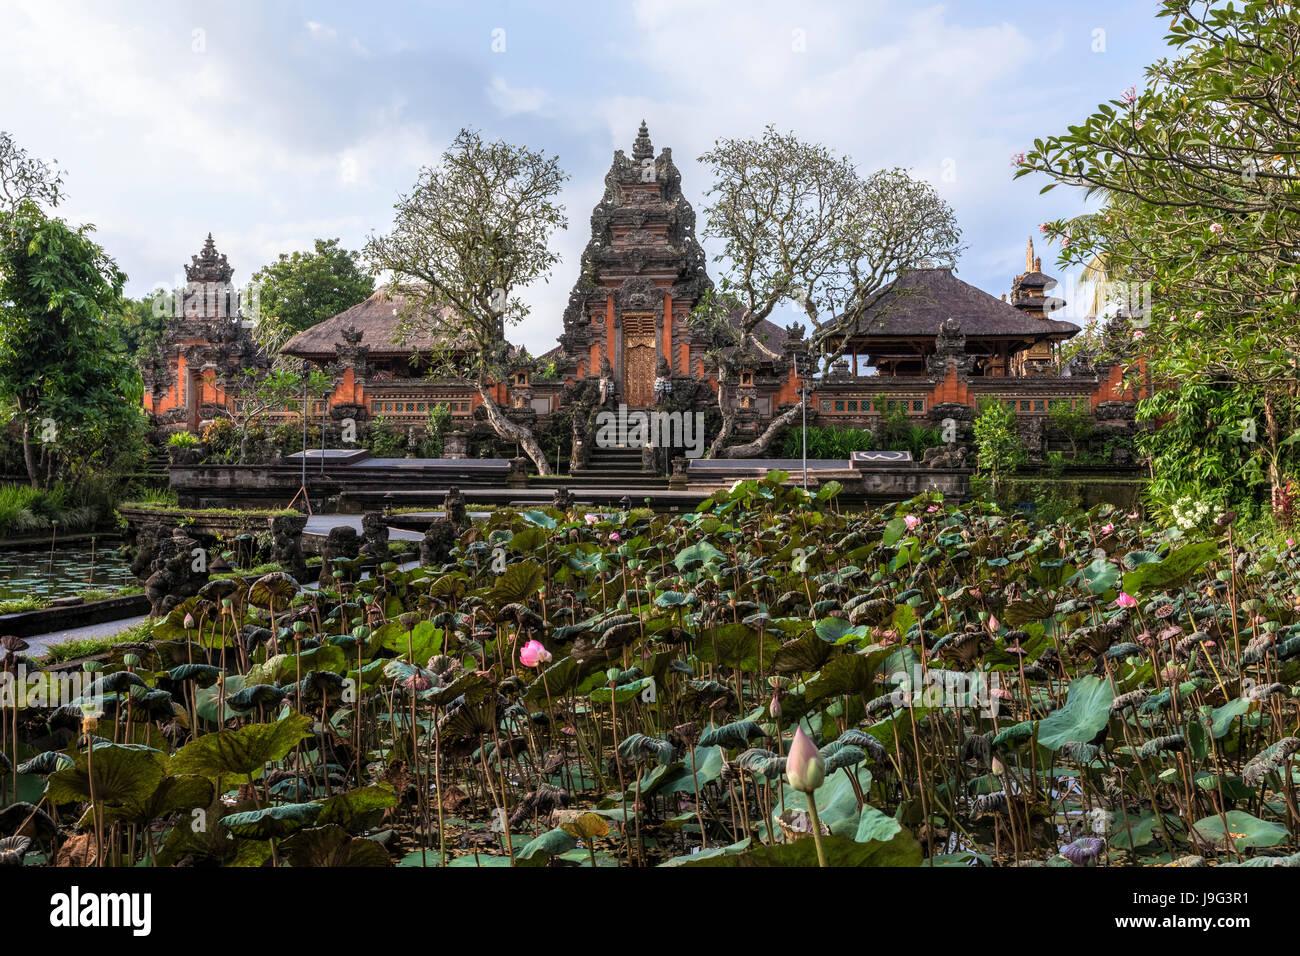 Taman Saraswati Temple, Ubud, Bali, Indonesia, Asia - Stock Image